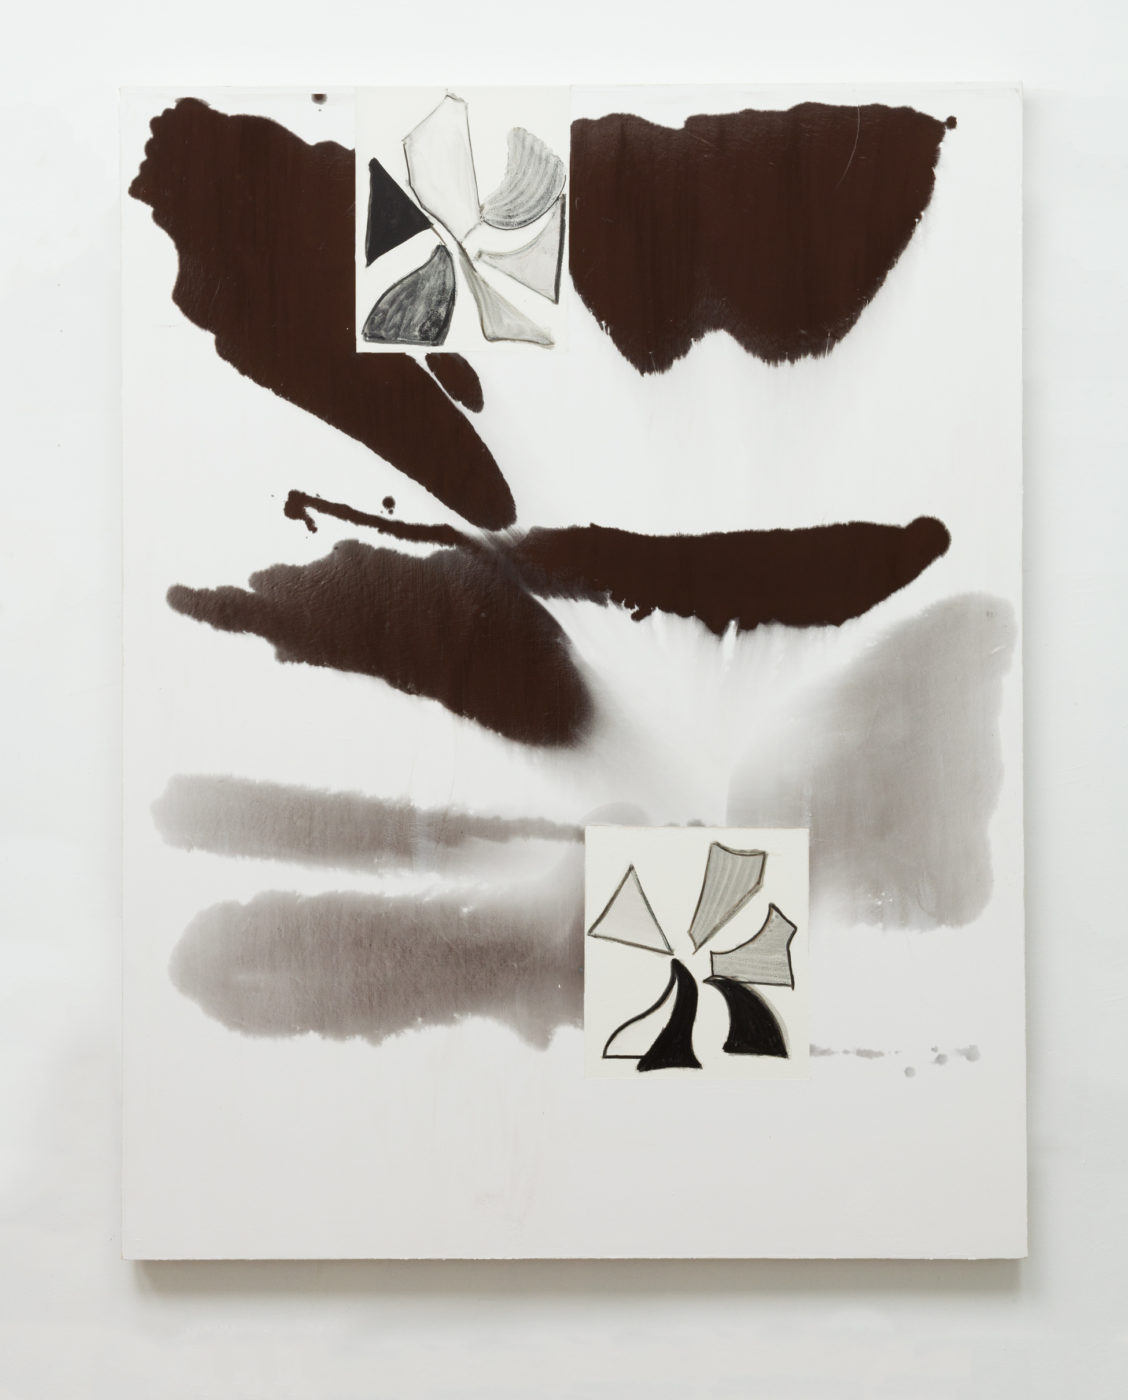 T293 - Henry Chapman - 2